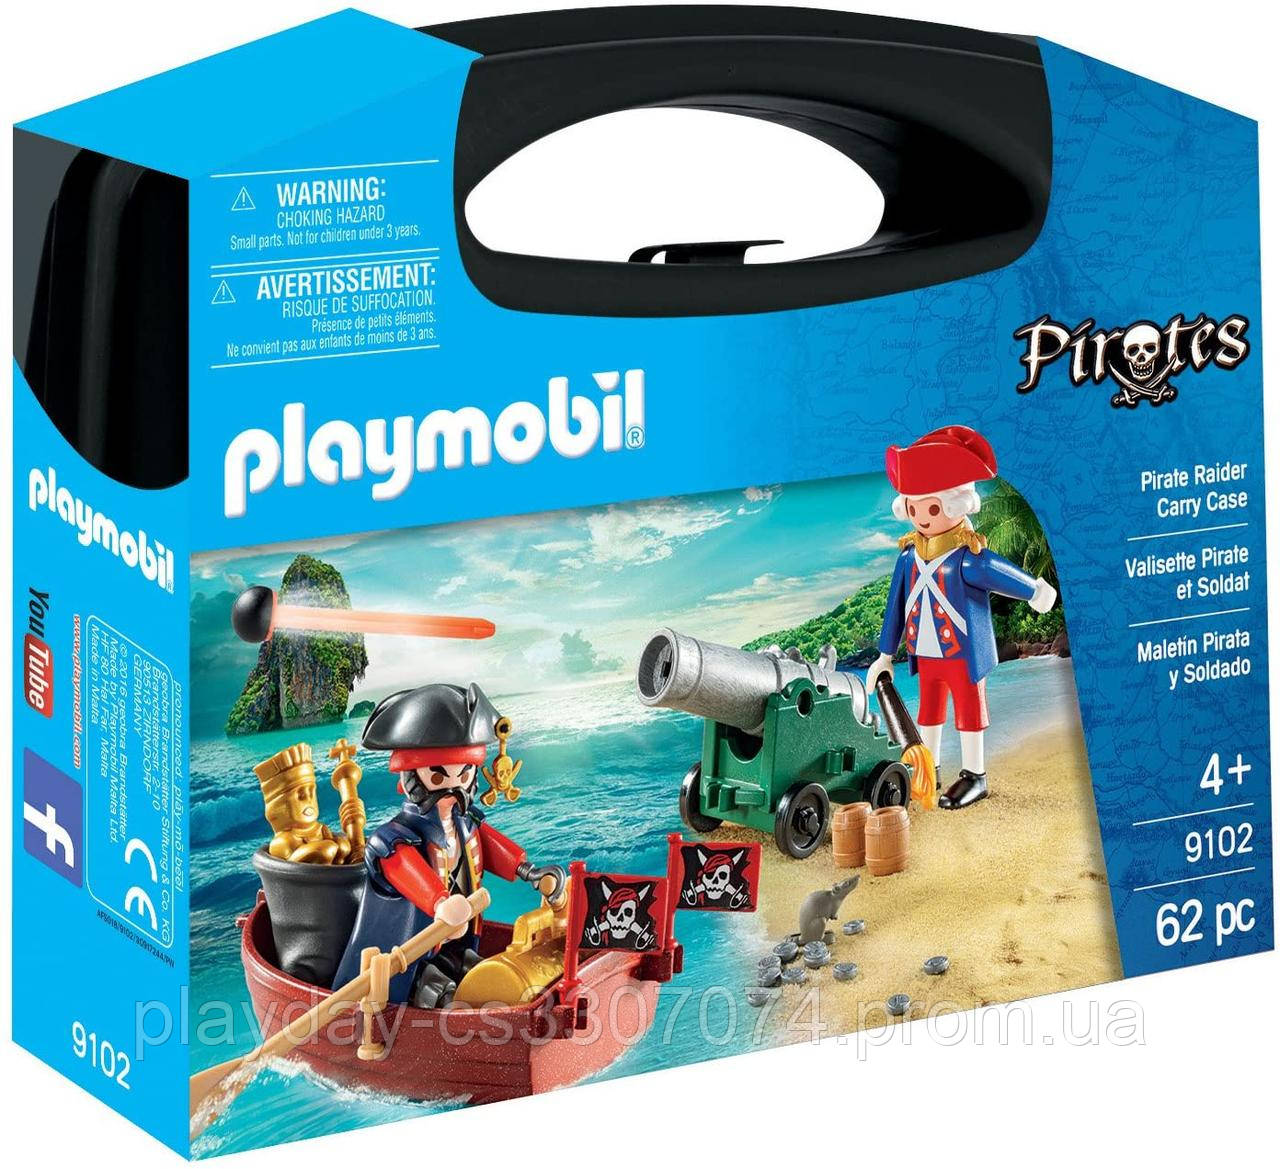 Игровой набор пират на лодке  Playmobil Pirate Raider carry case